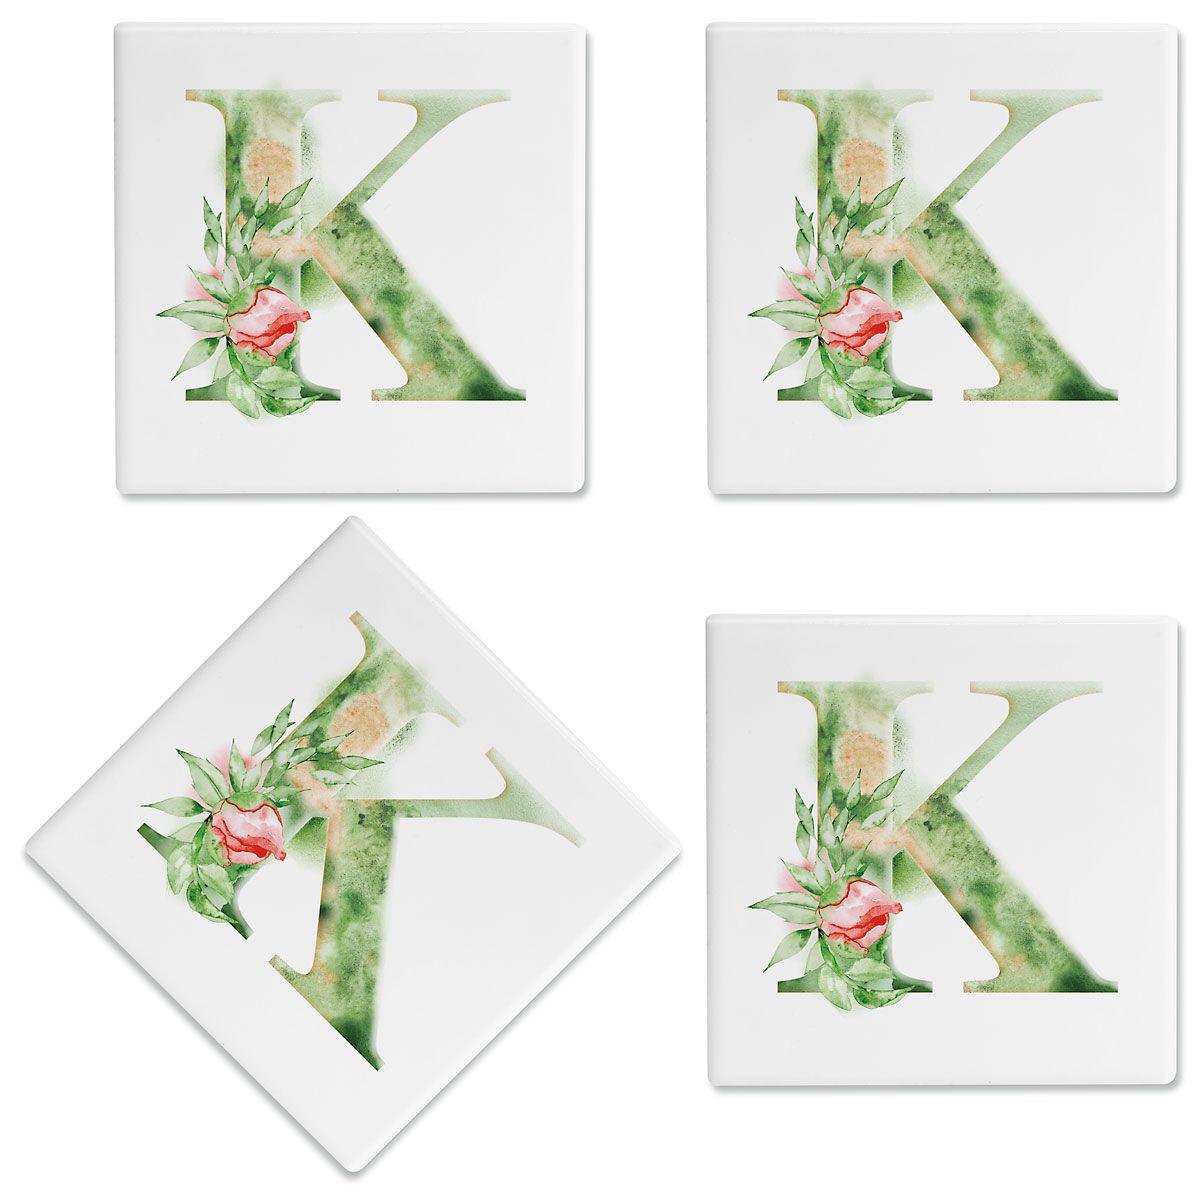 Watercolor Initial Customized Ceramic Coasters